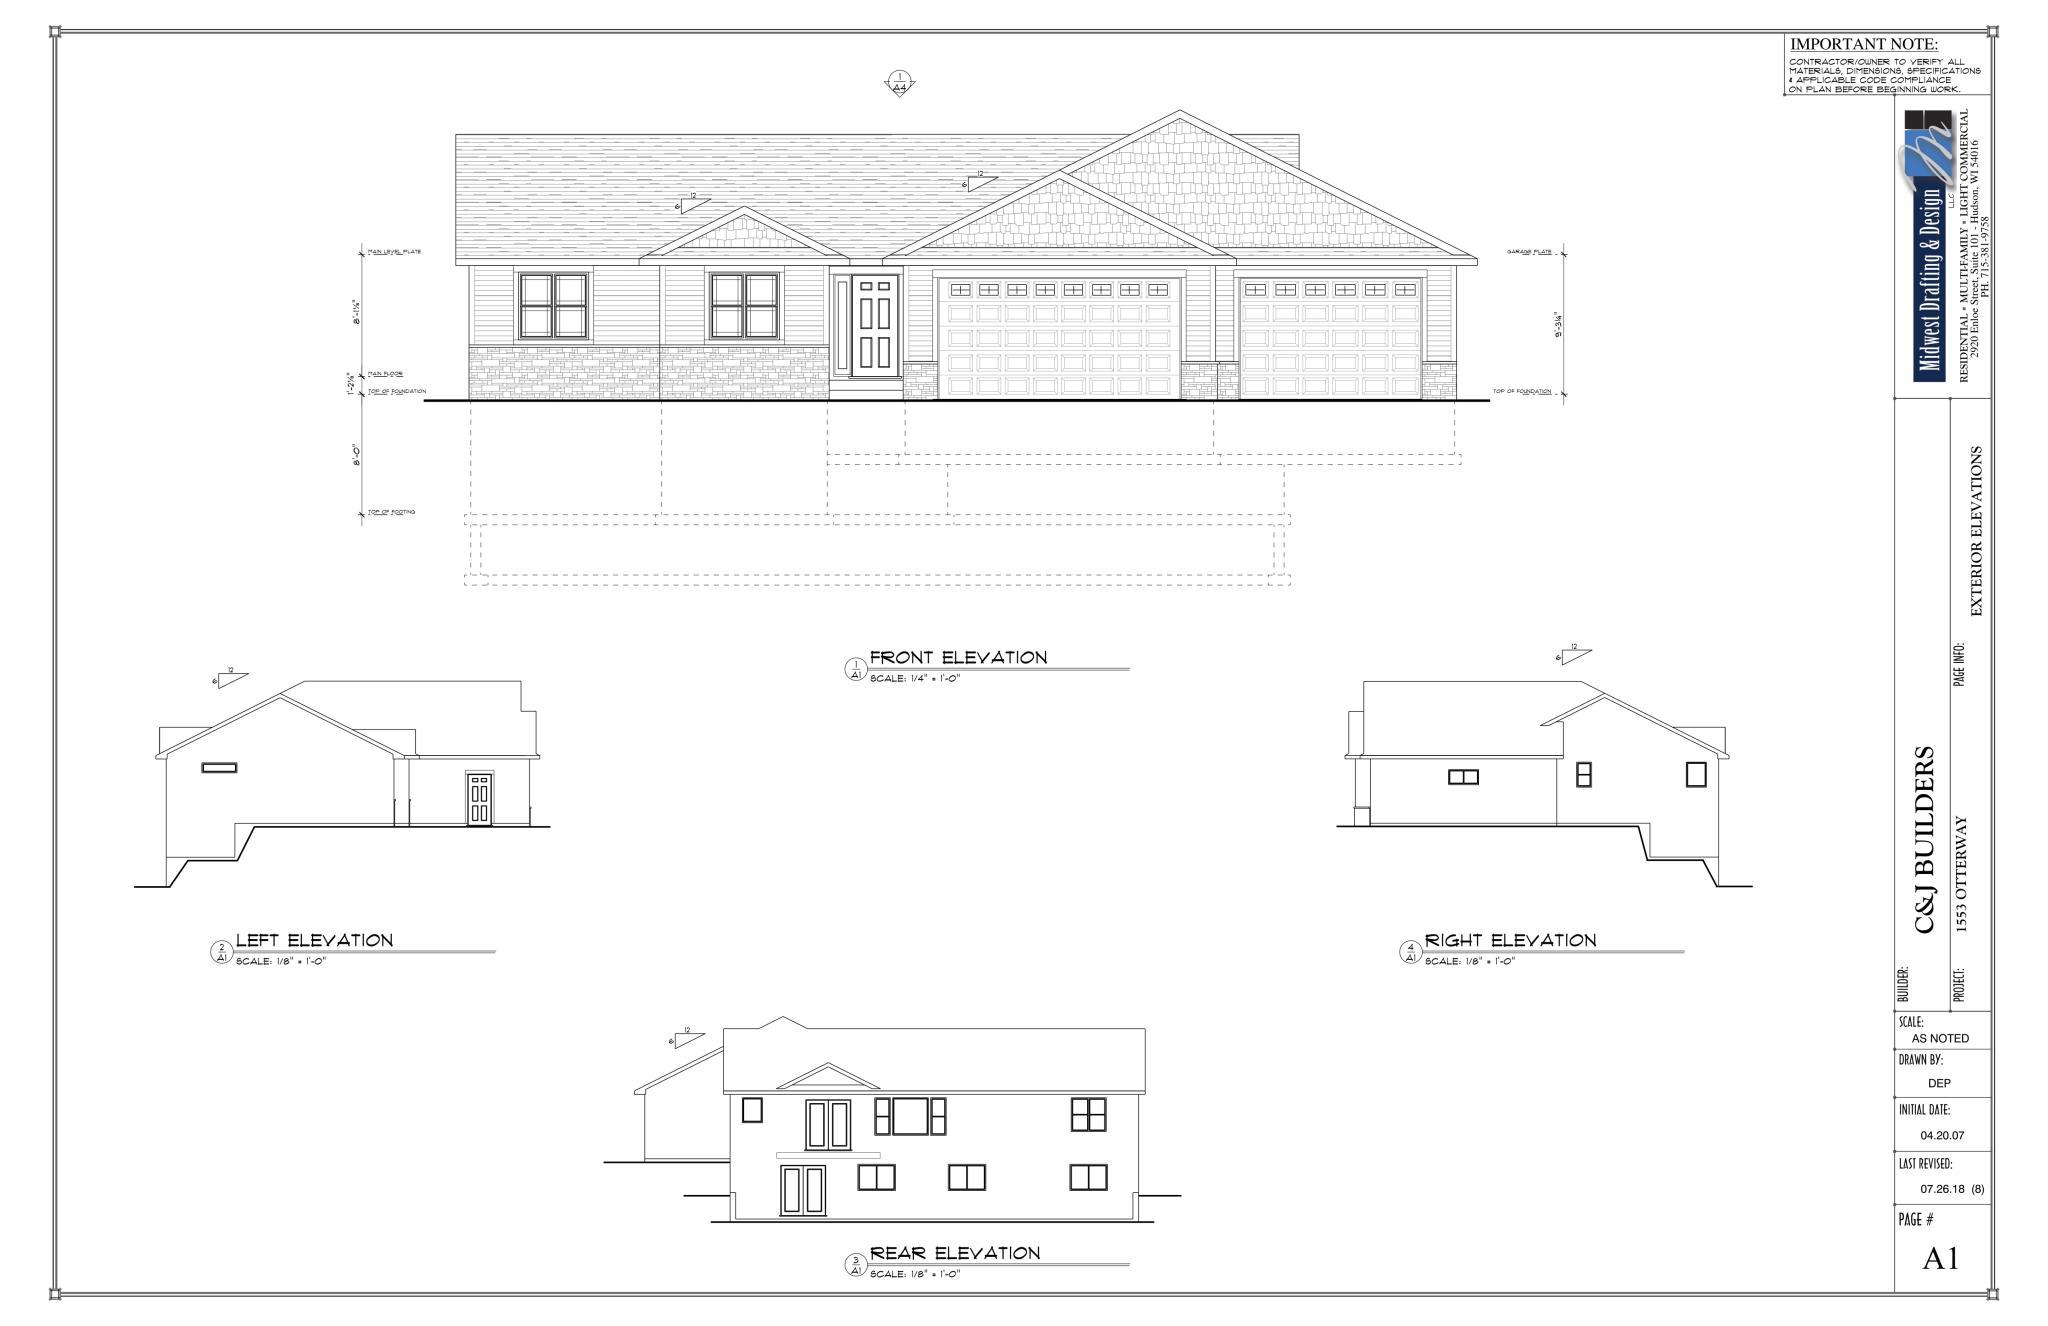 3 Bed Rambler Plan, New Richmond, WI 54017 - 5 Photos   Trulia